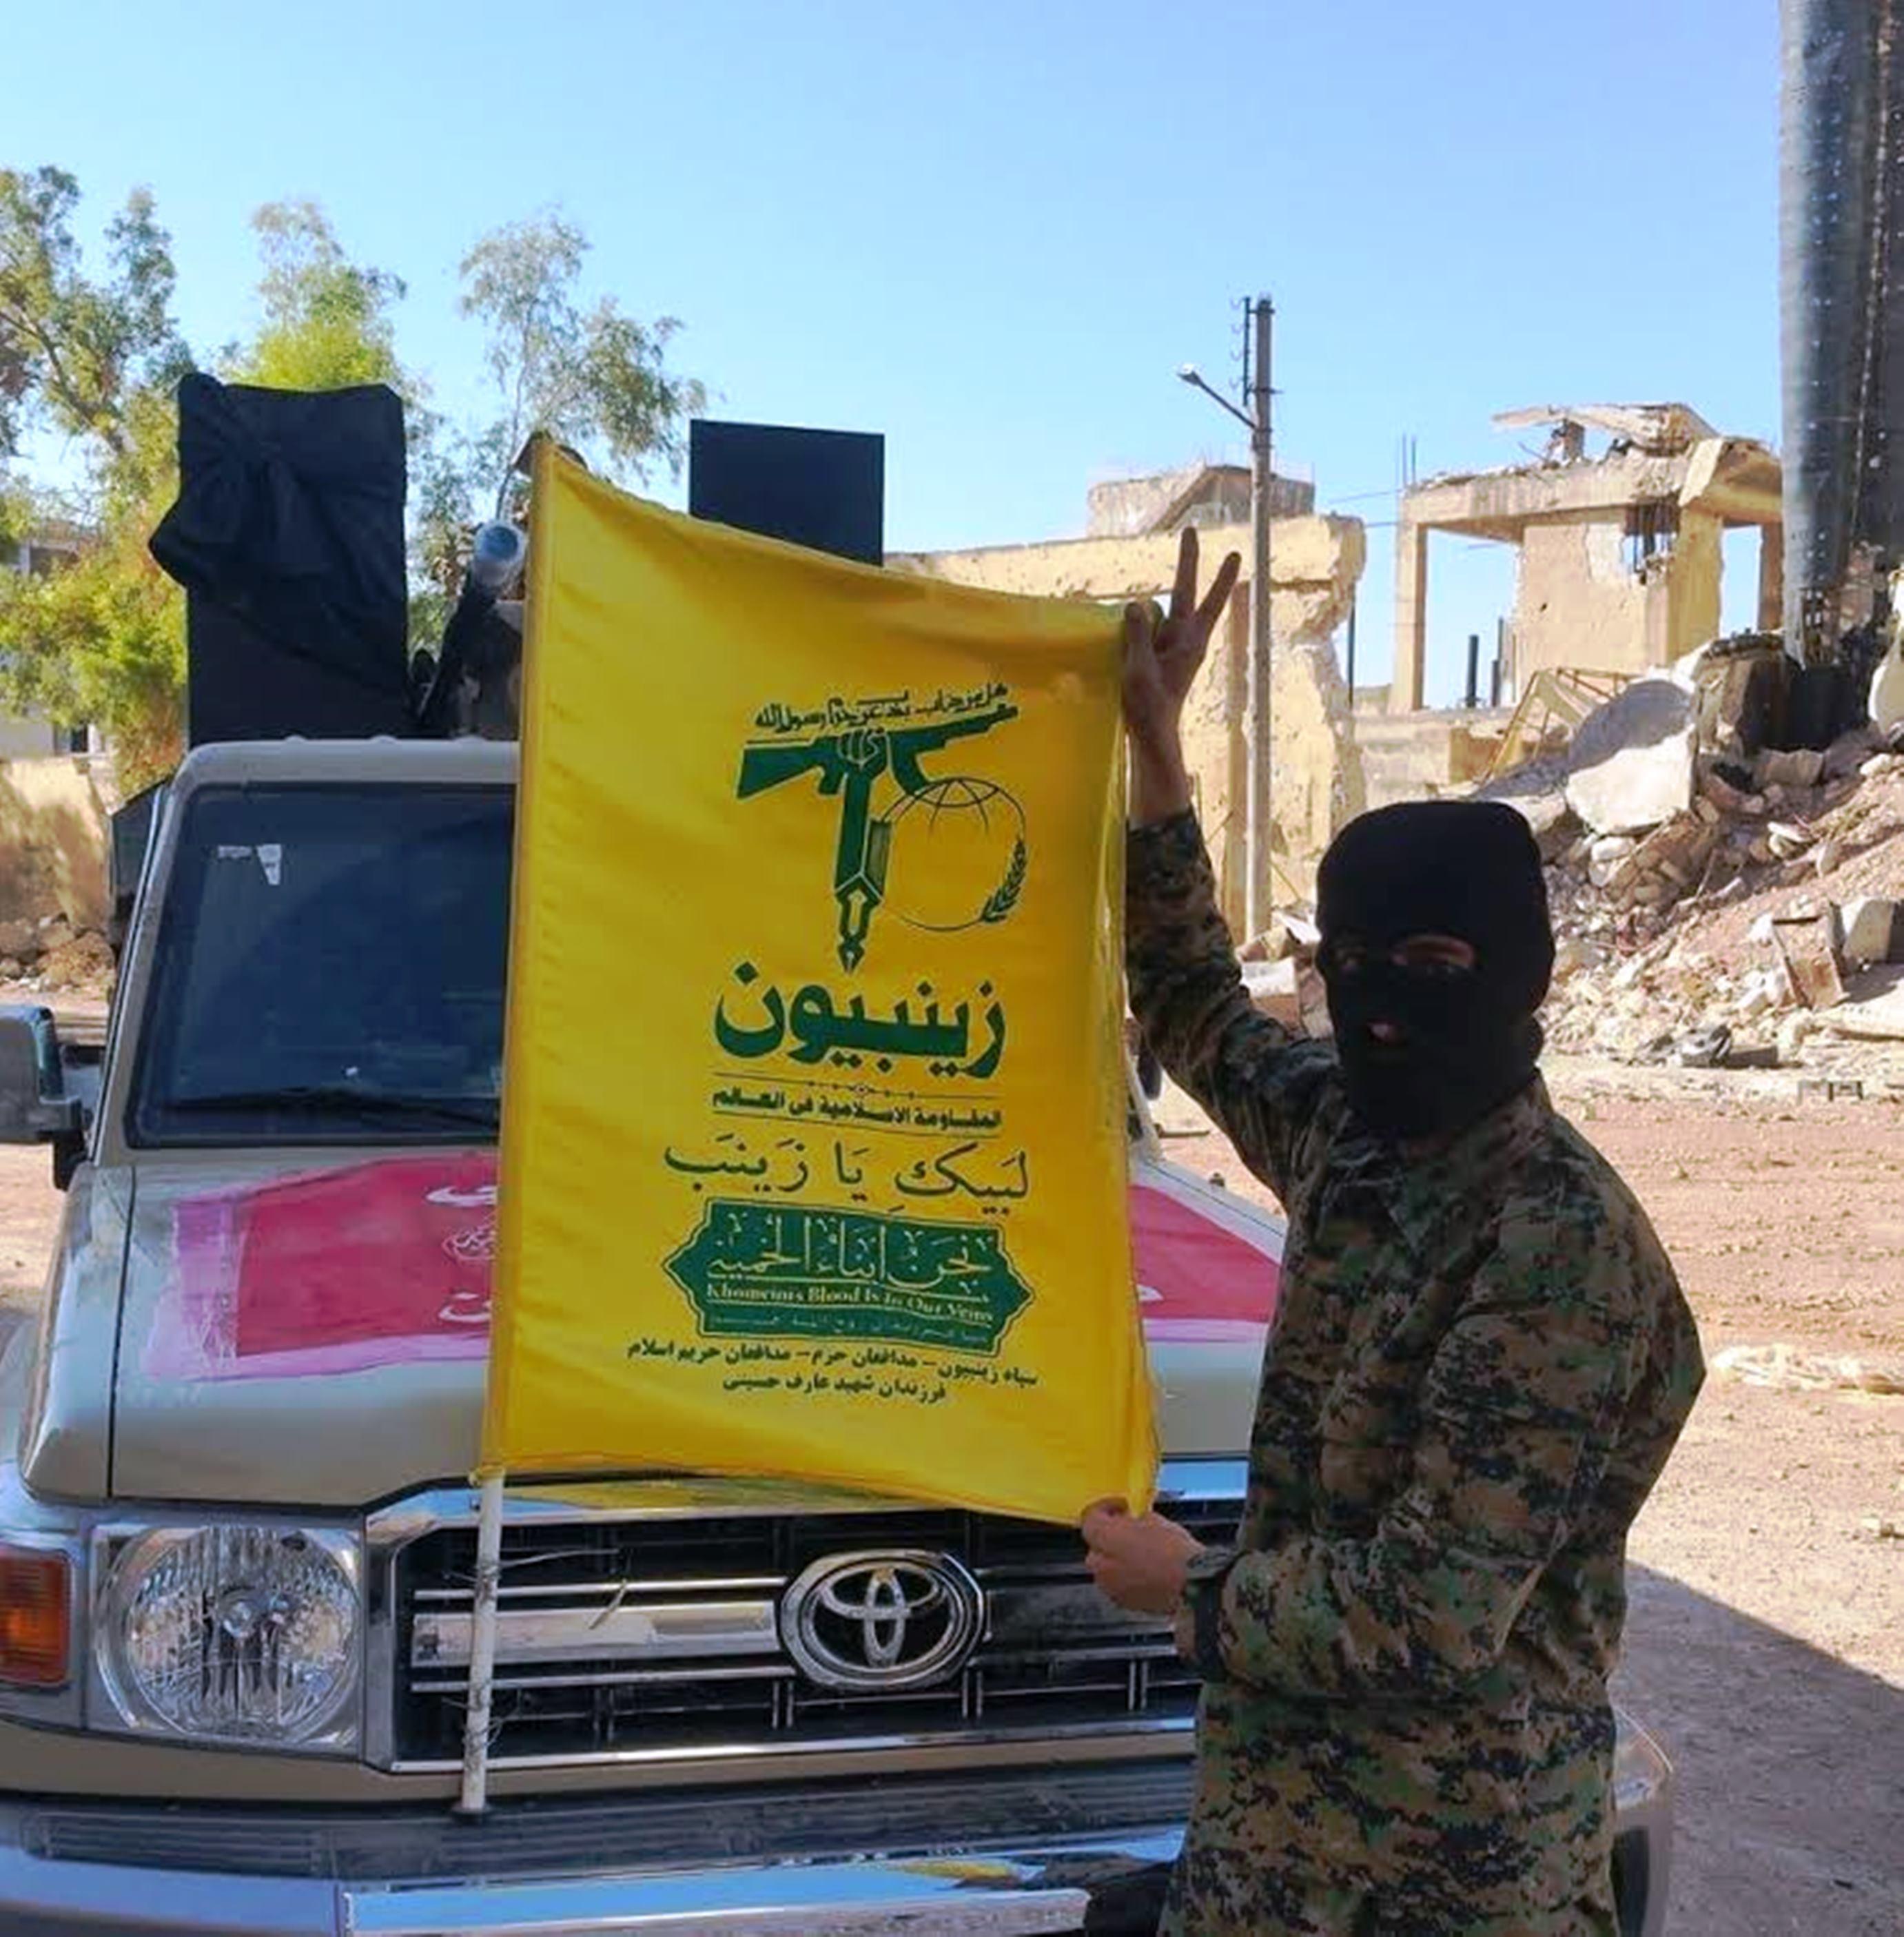 Use of Pakistani brigade reveals Iran's sectarian tactics in regional conflict